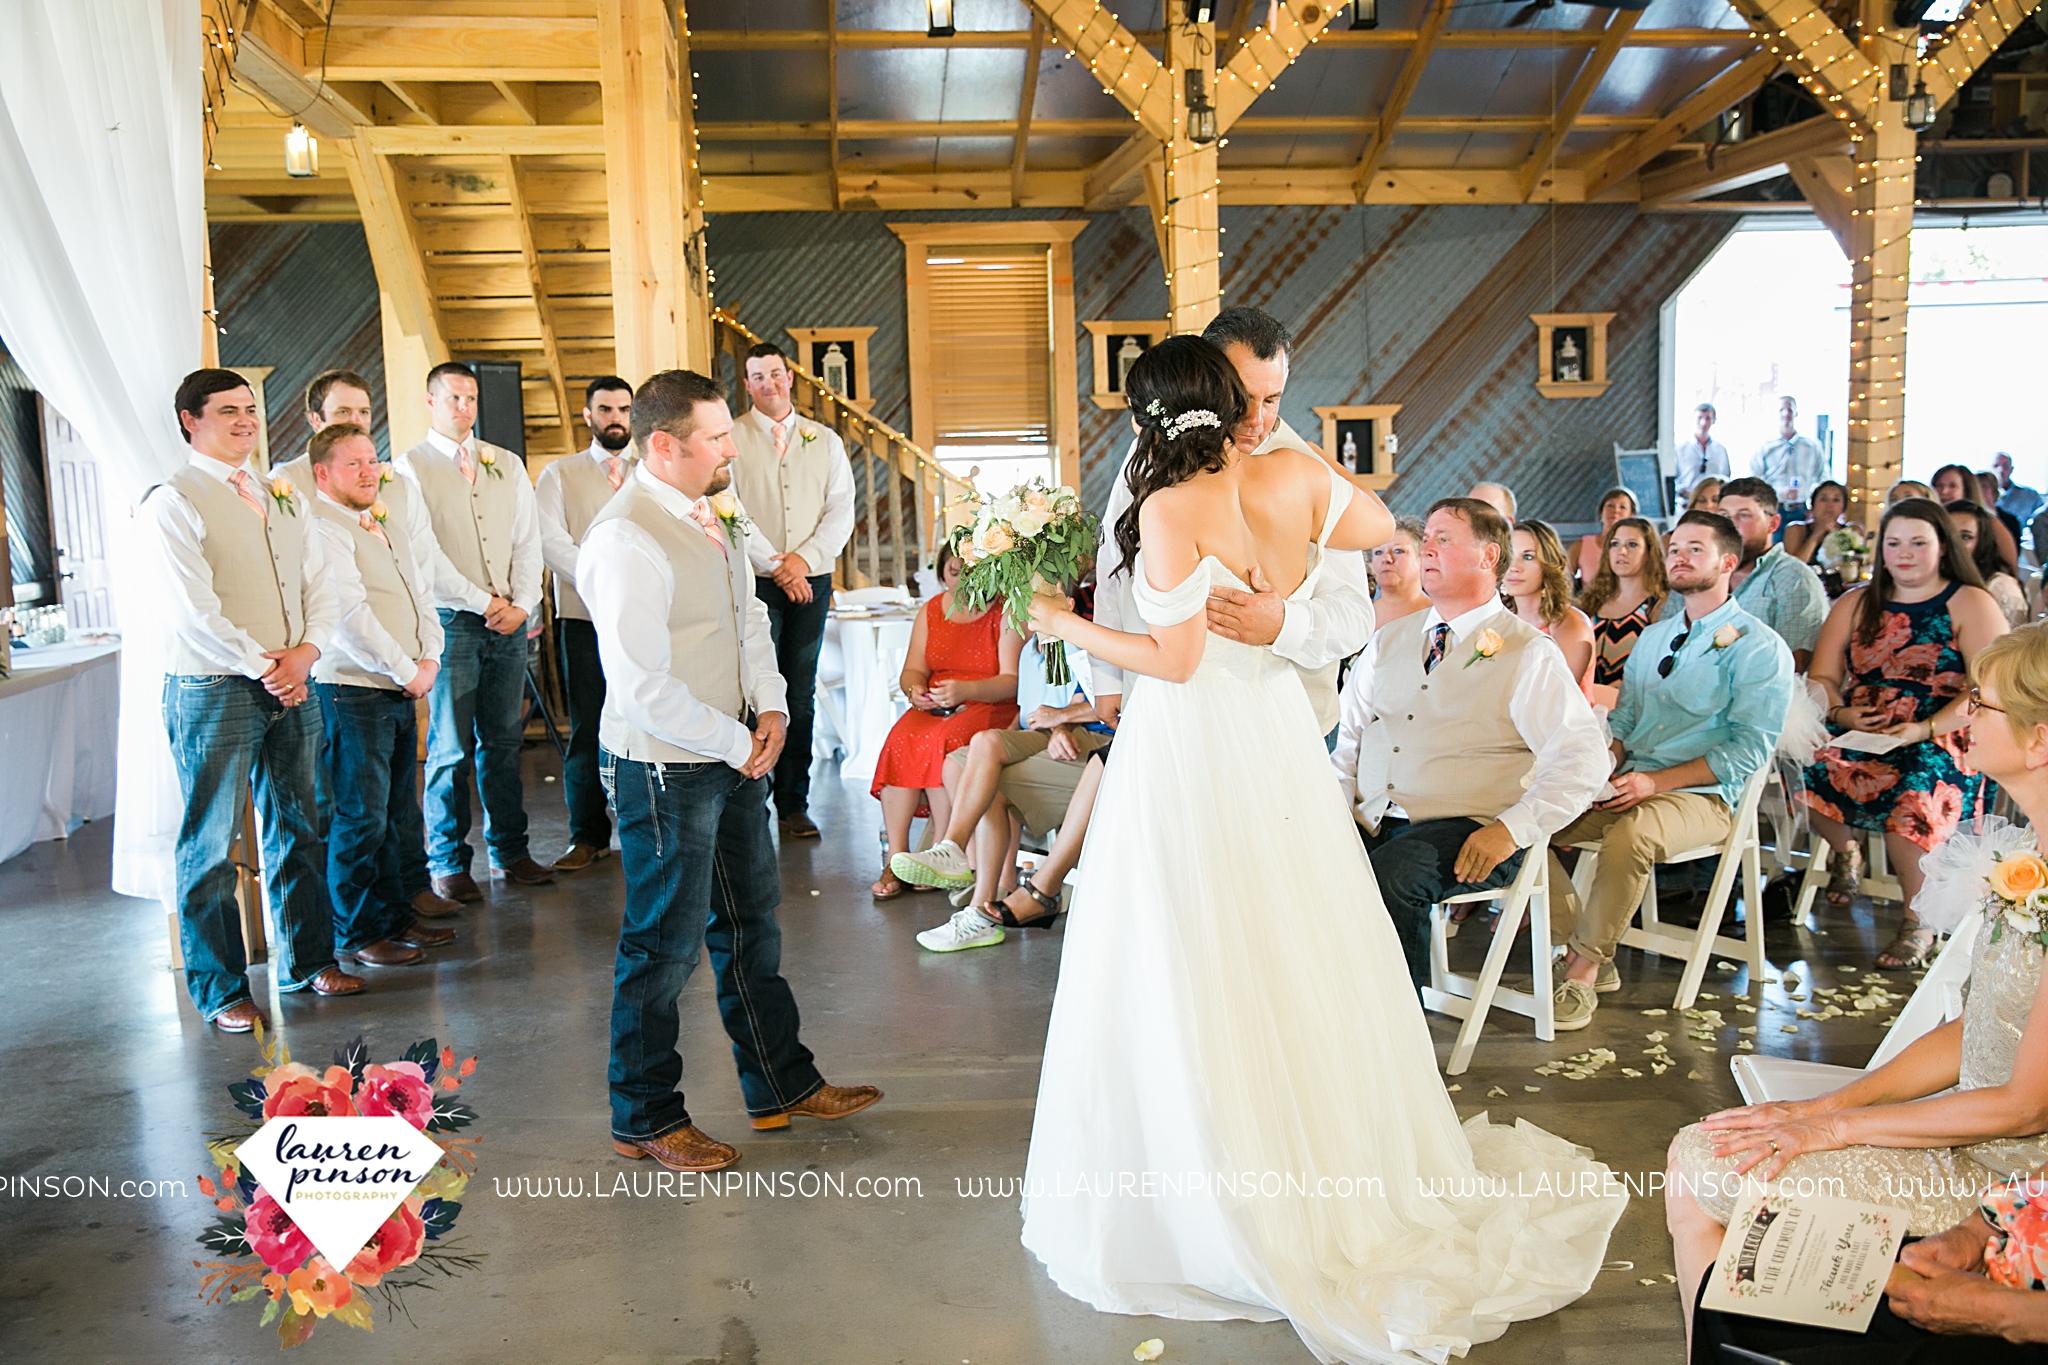 jones-barn-willow-creek-ranch-wedding-in-cleburne-texas-fort-worth-dfw-wichita-falls-wedding-photography_3241.jpg